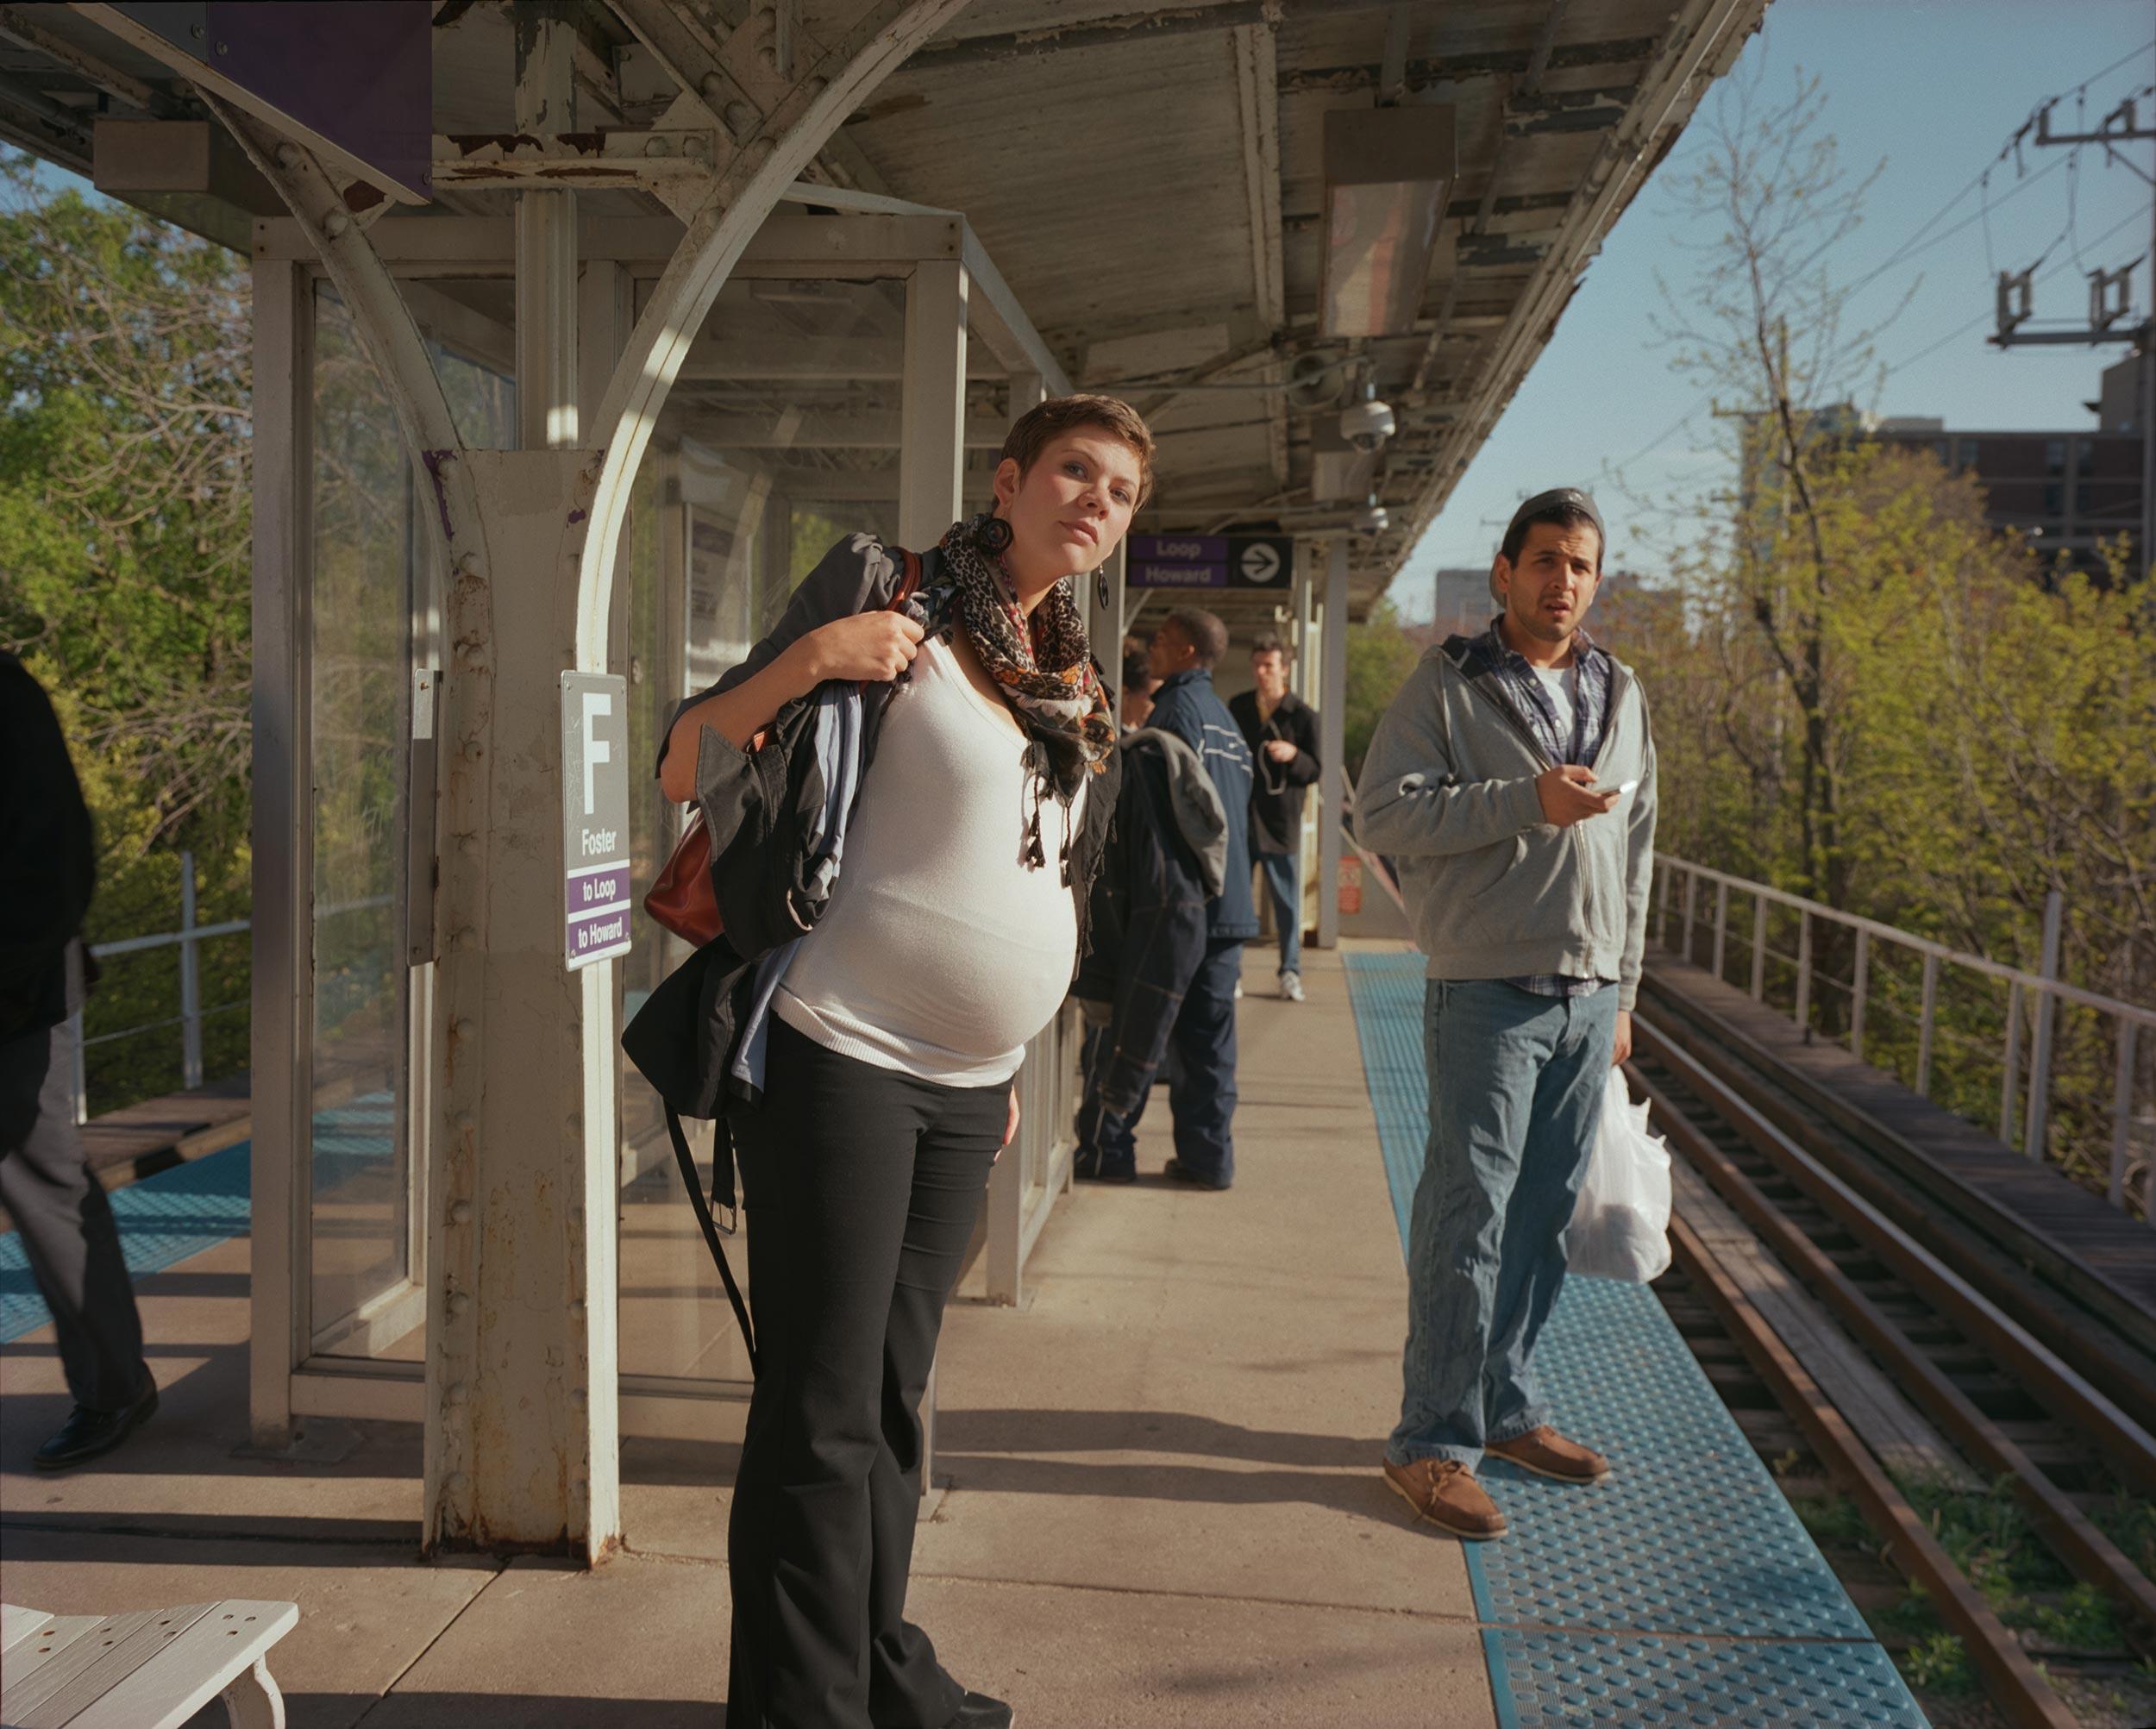 showing-slideshow-commuting-melissa-ann-pinney.jpg